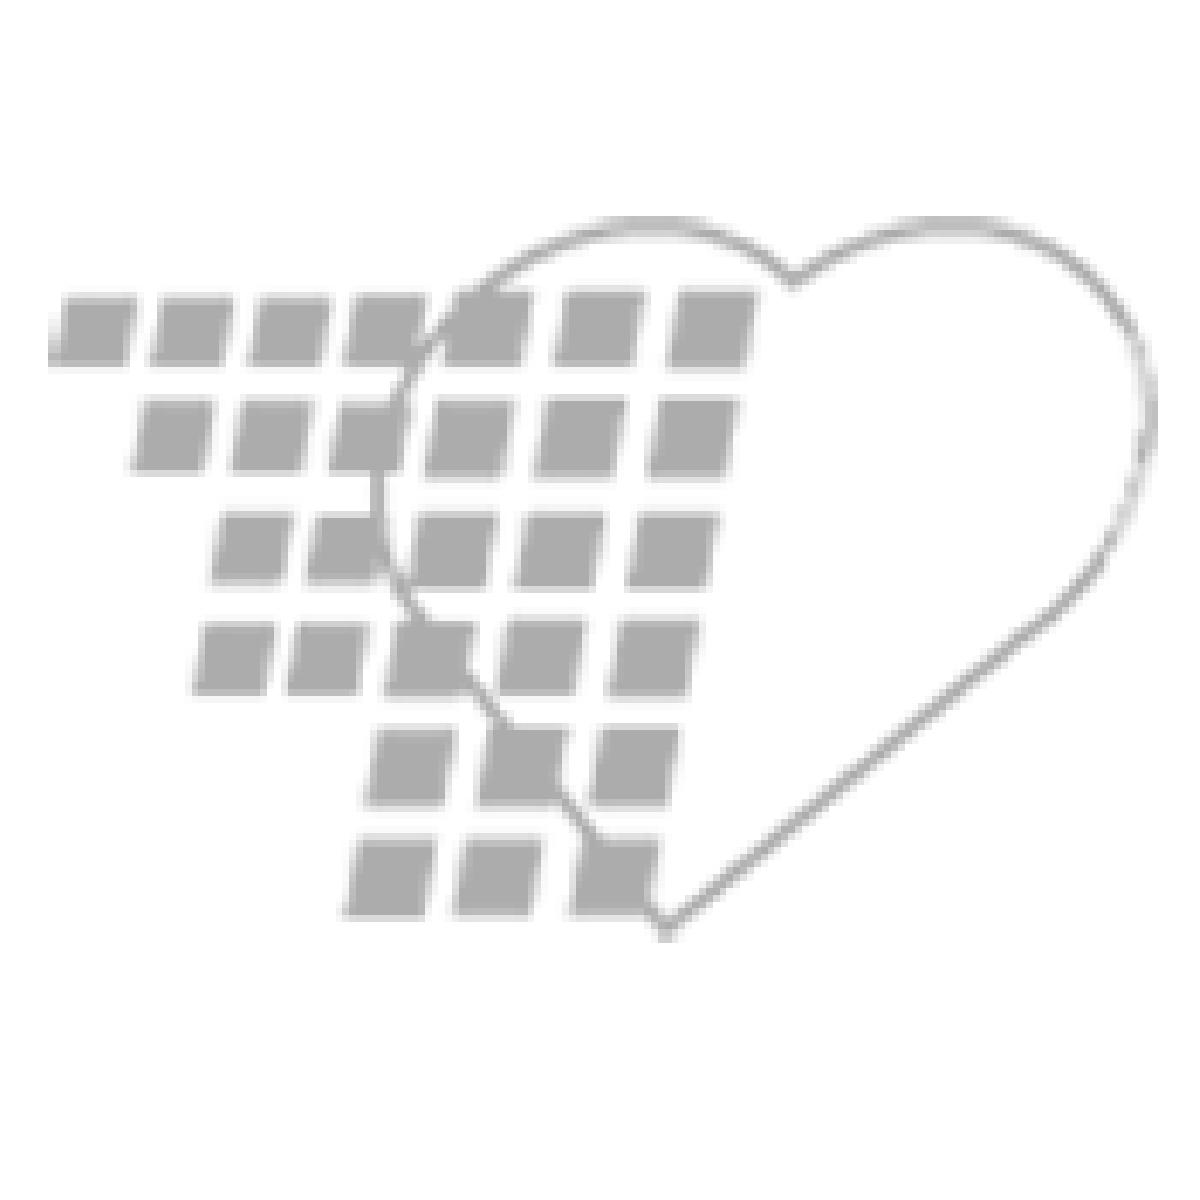 09-31-1001 - Pocket Nurse® Laminated Respiratory Inhaler and Medications Poster